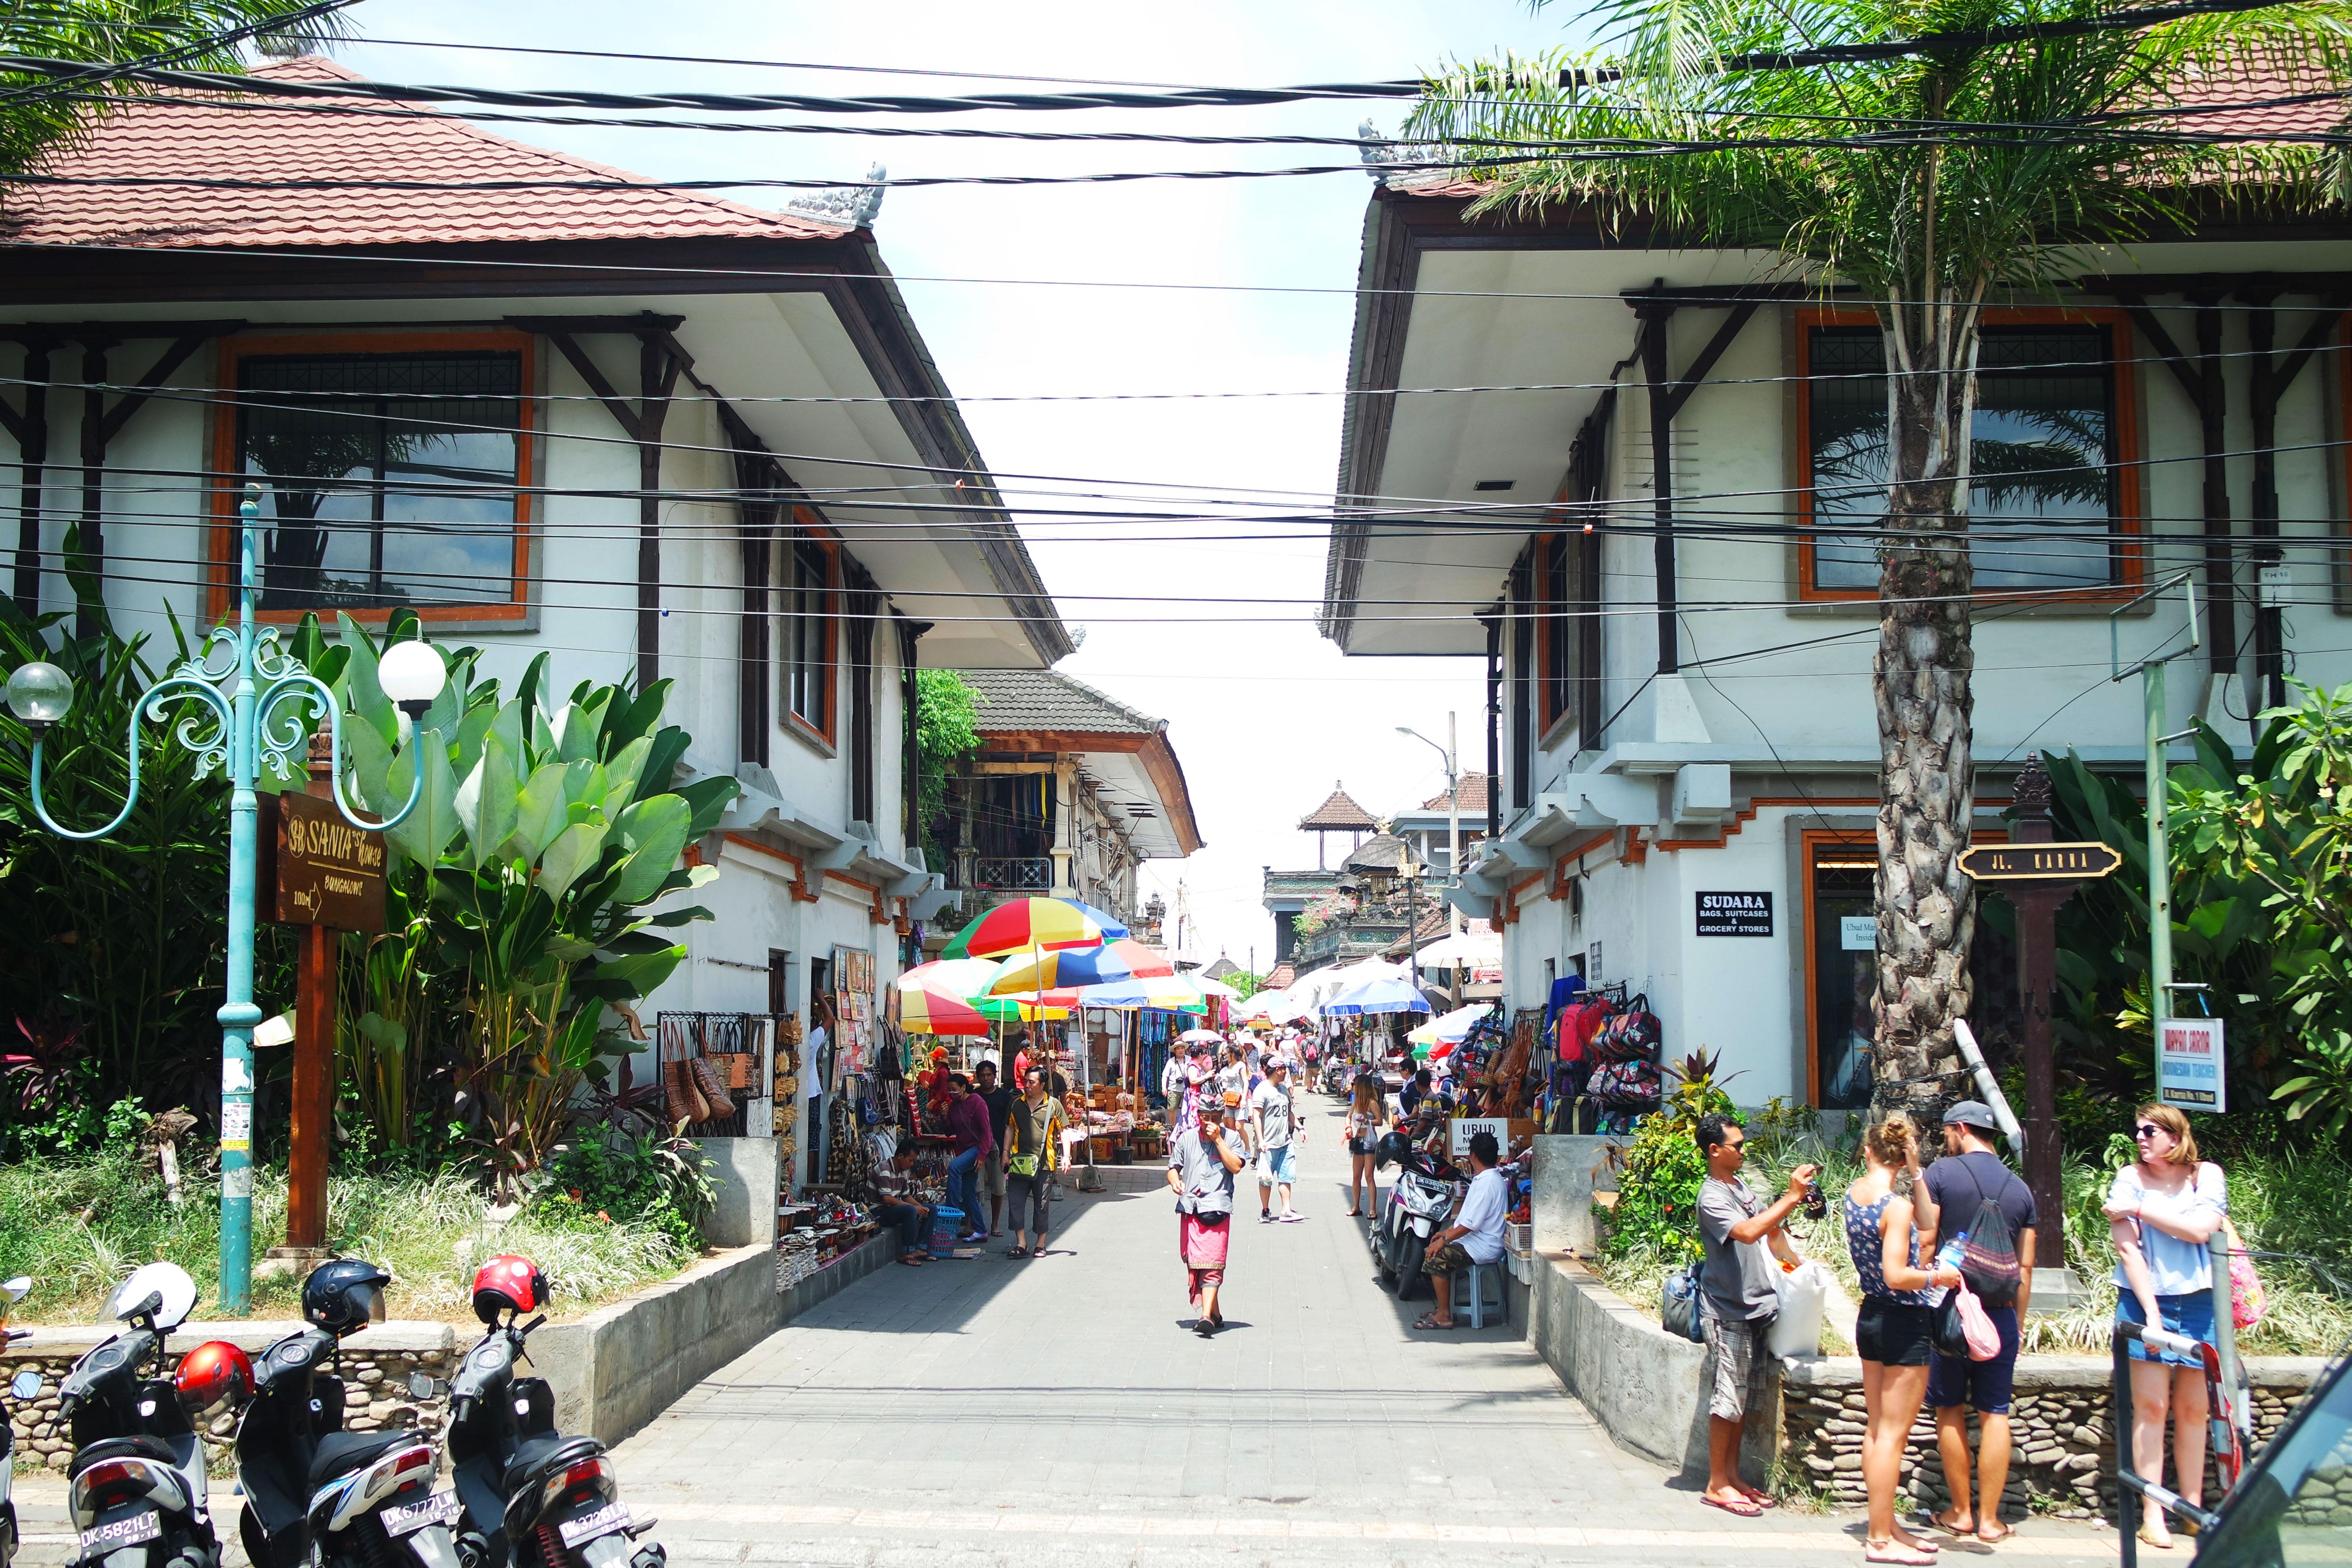 ubud-market-souvenirs-bli-guide